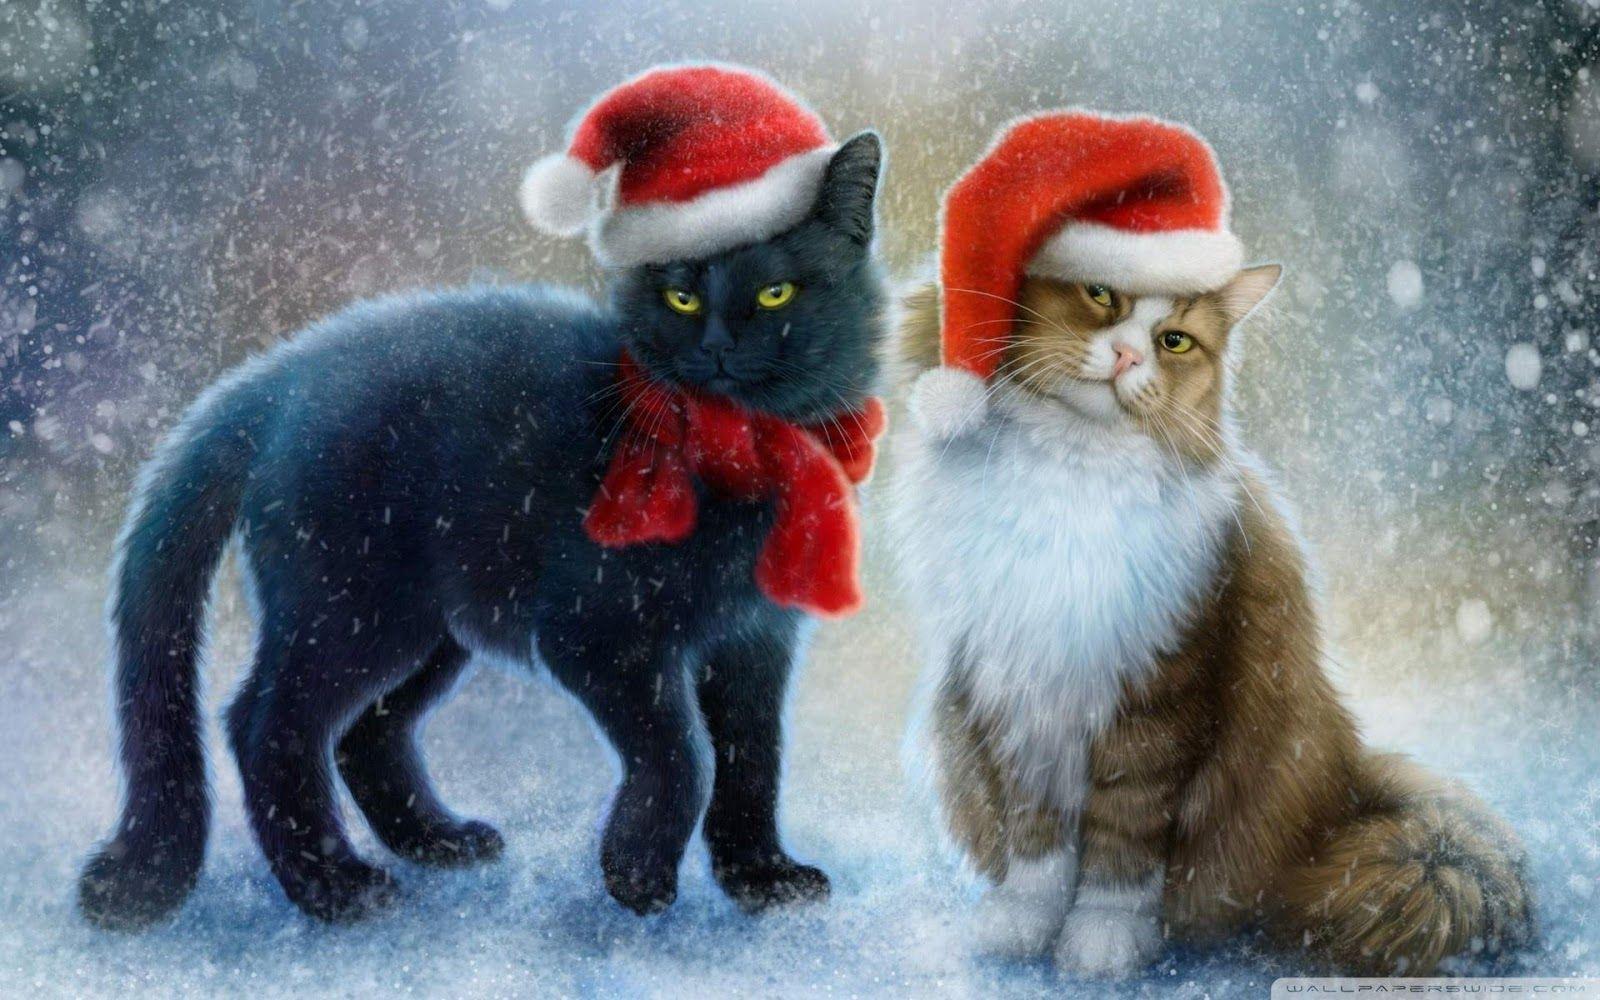 1080p Hd Christmas Cat Wallpaper High Quality Desktop